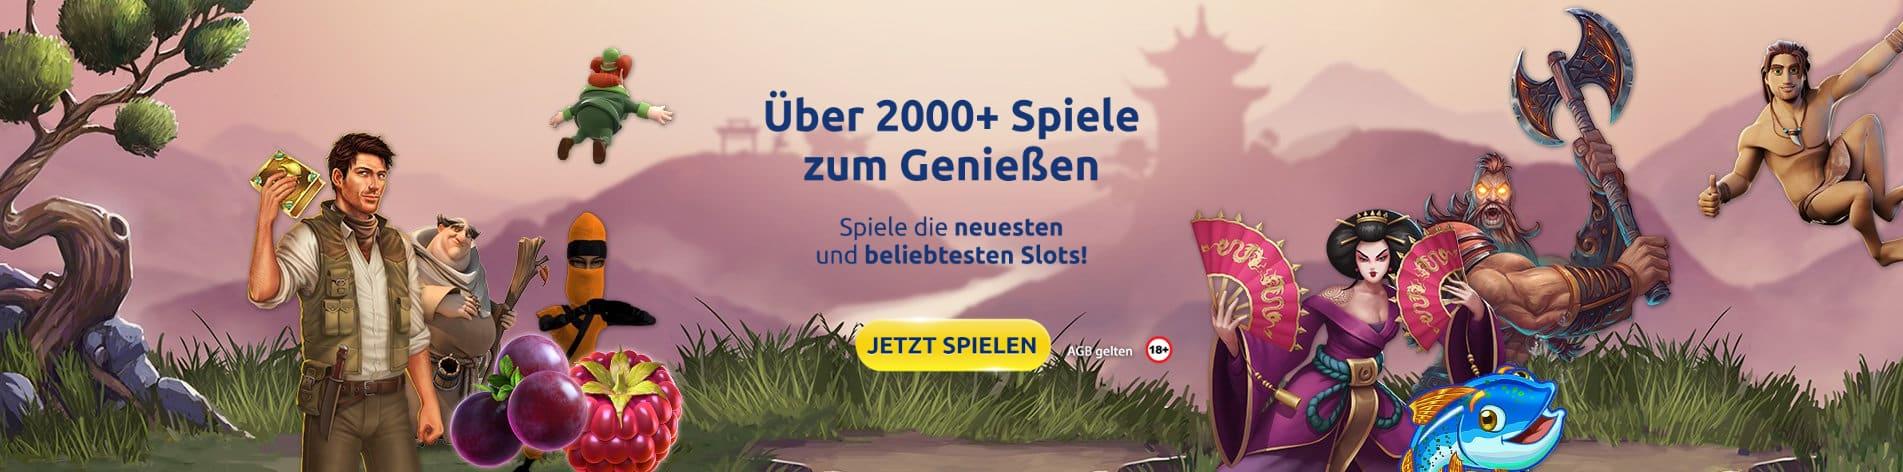 DrückGlück Casino Content Images - Germany CasinoTop 01